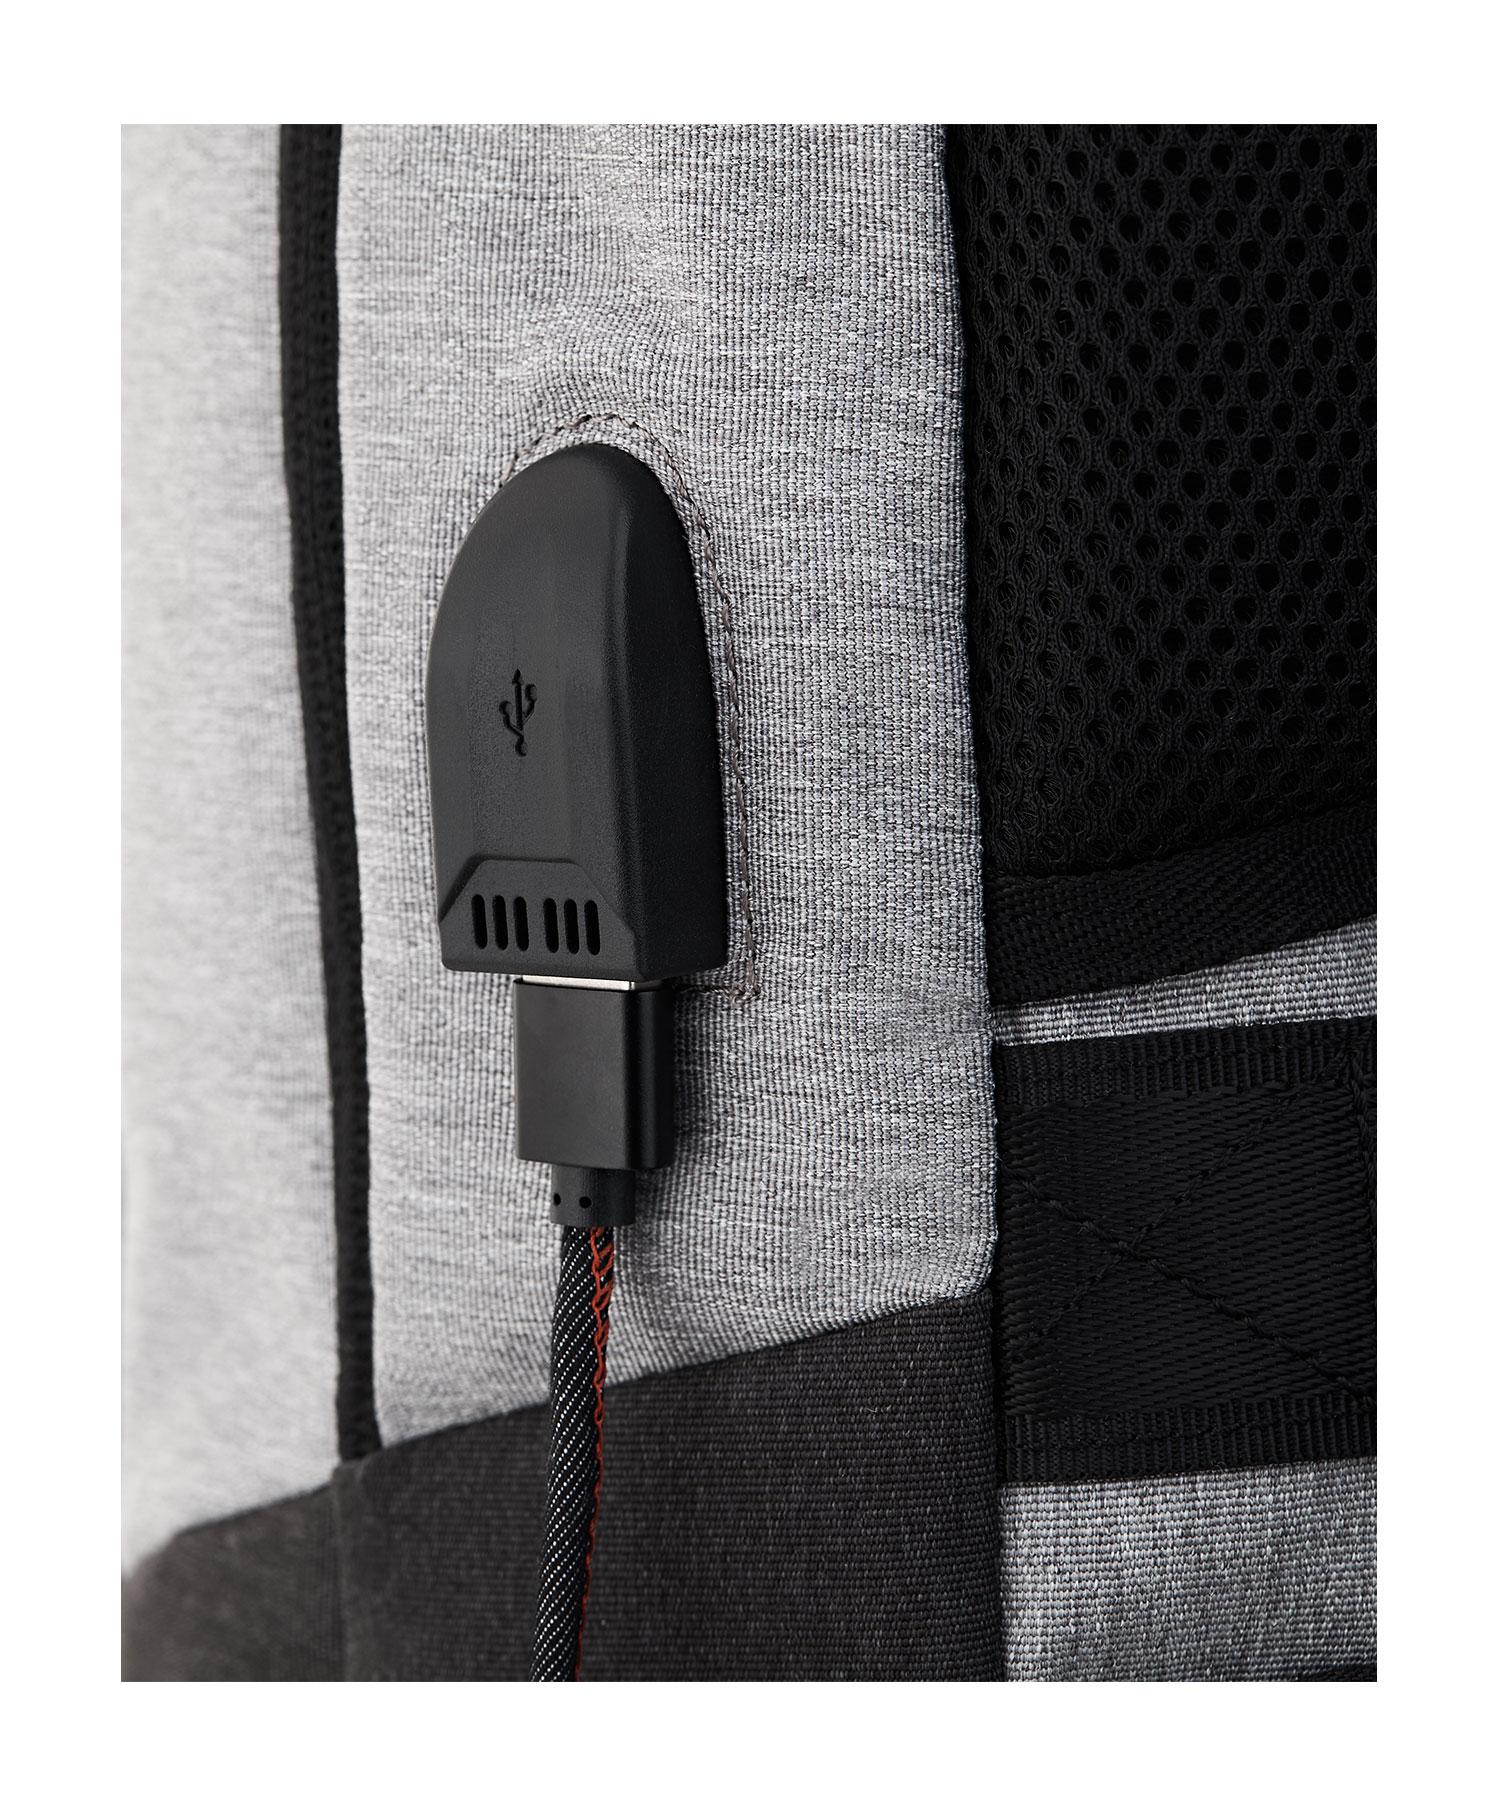 backpack usb charging port